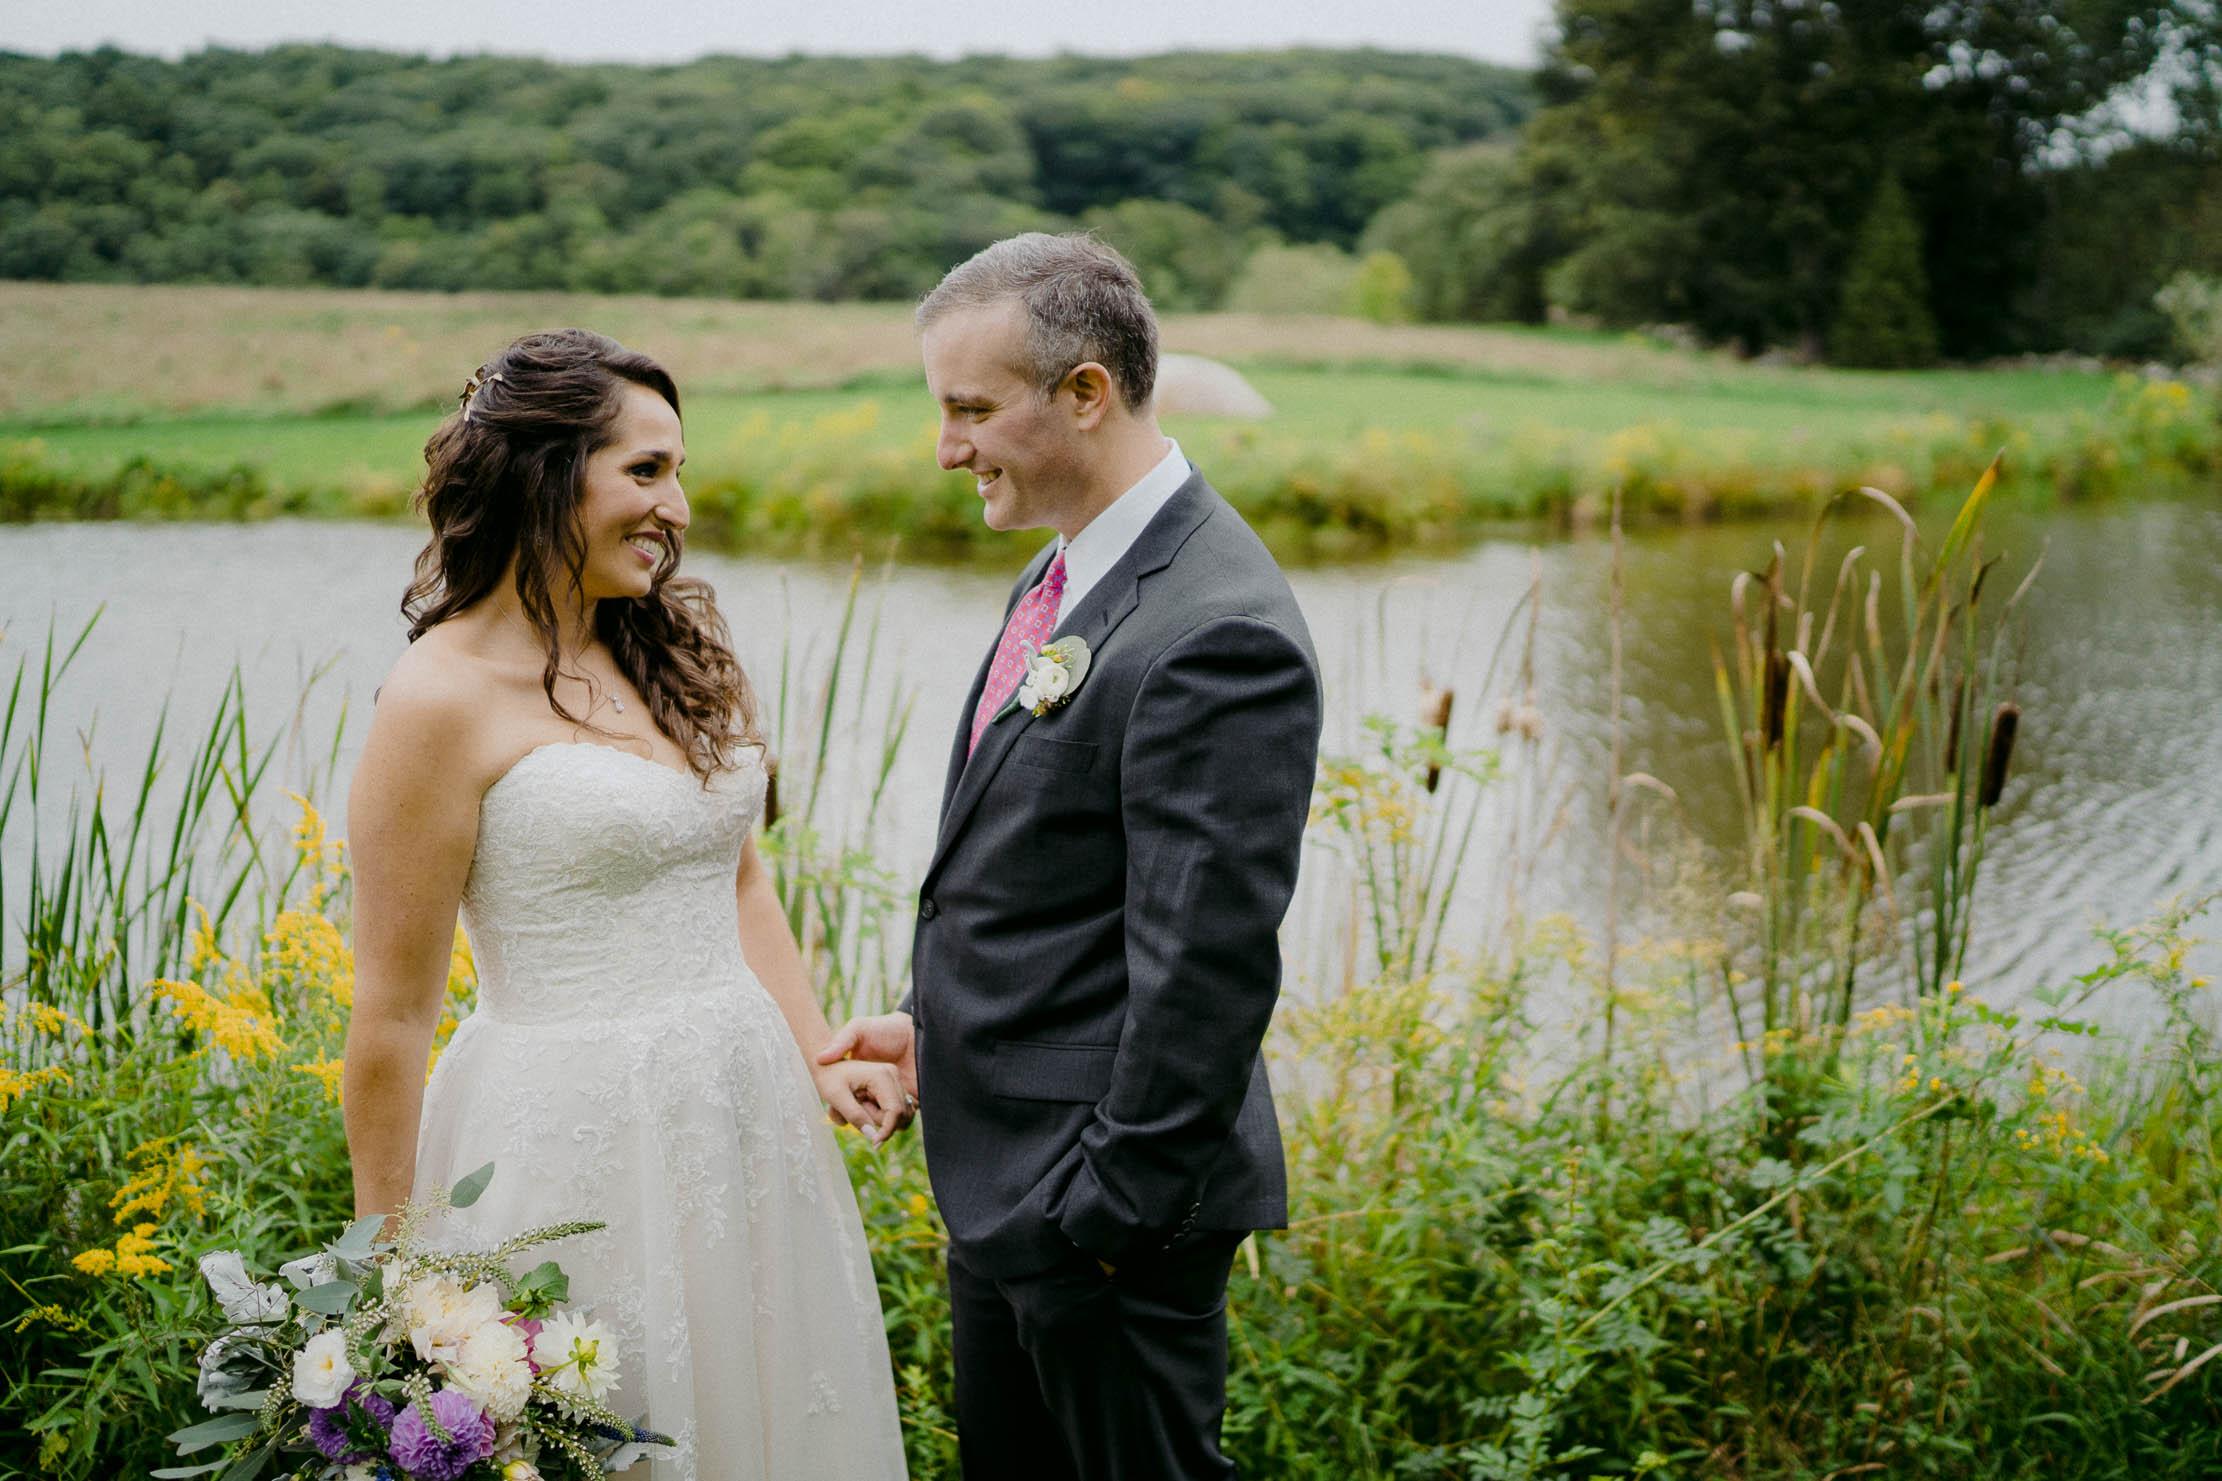 Wings-Castle-Millbrook-NY-Upstate-Wedding-Photographer-1045.jpg